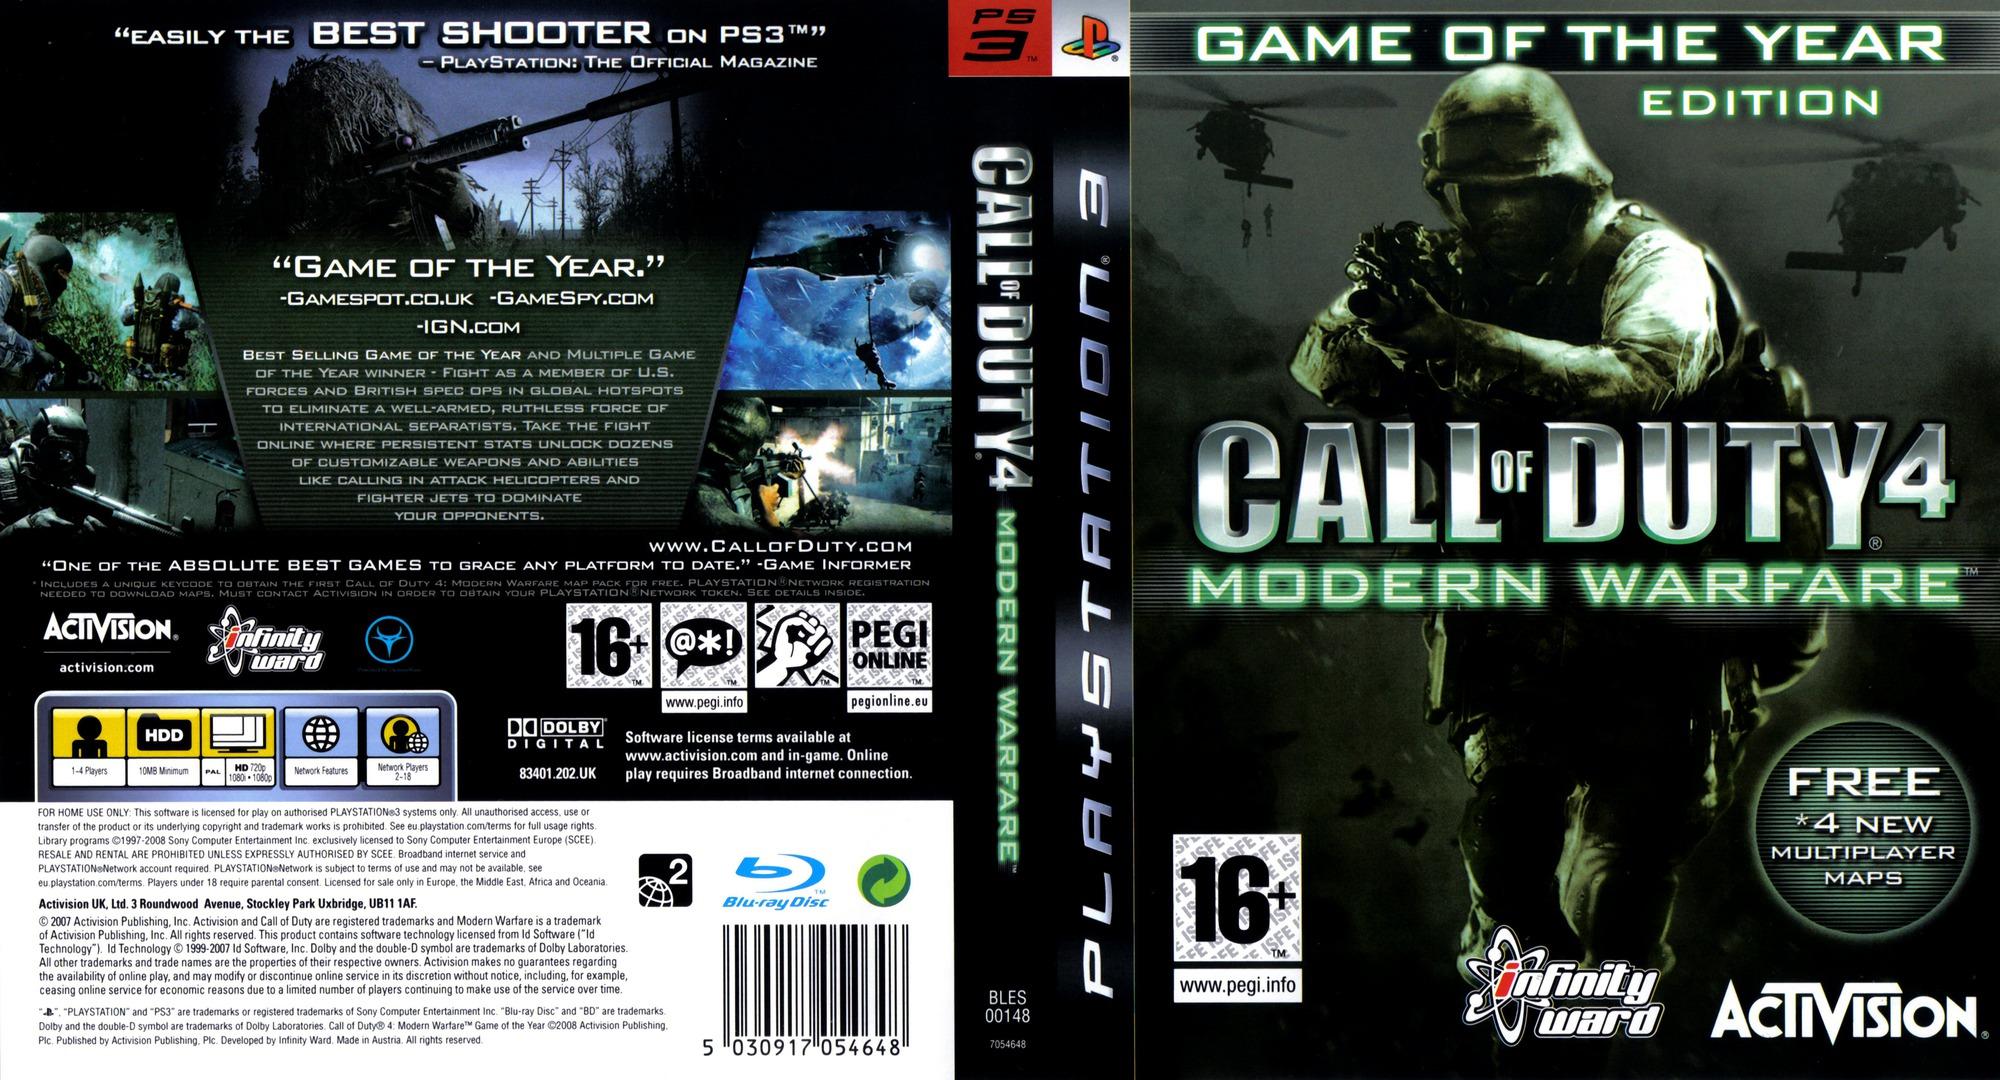 Call of Duty 4: Modern Warfare PS3 coverfullHQB (BLES00148)